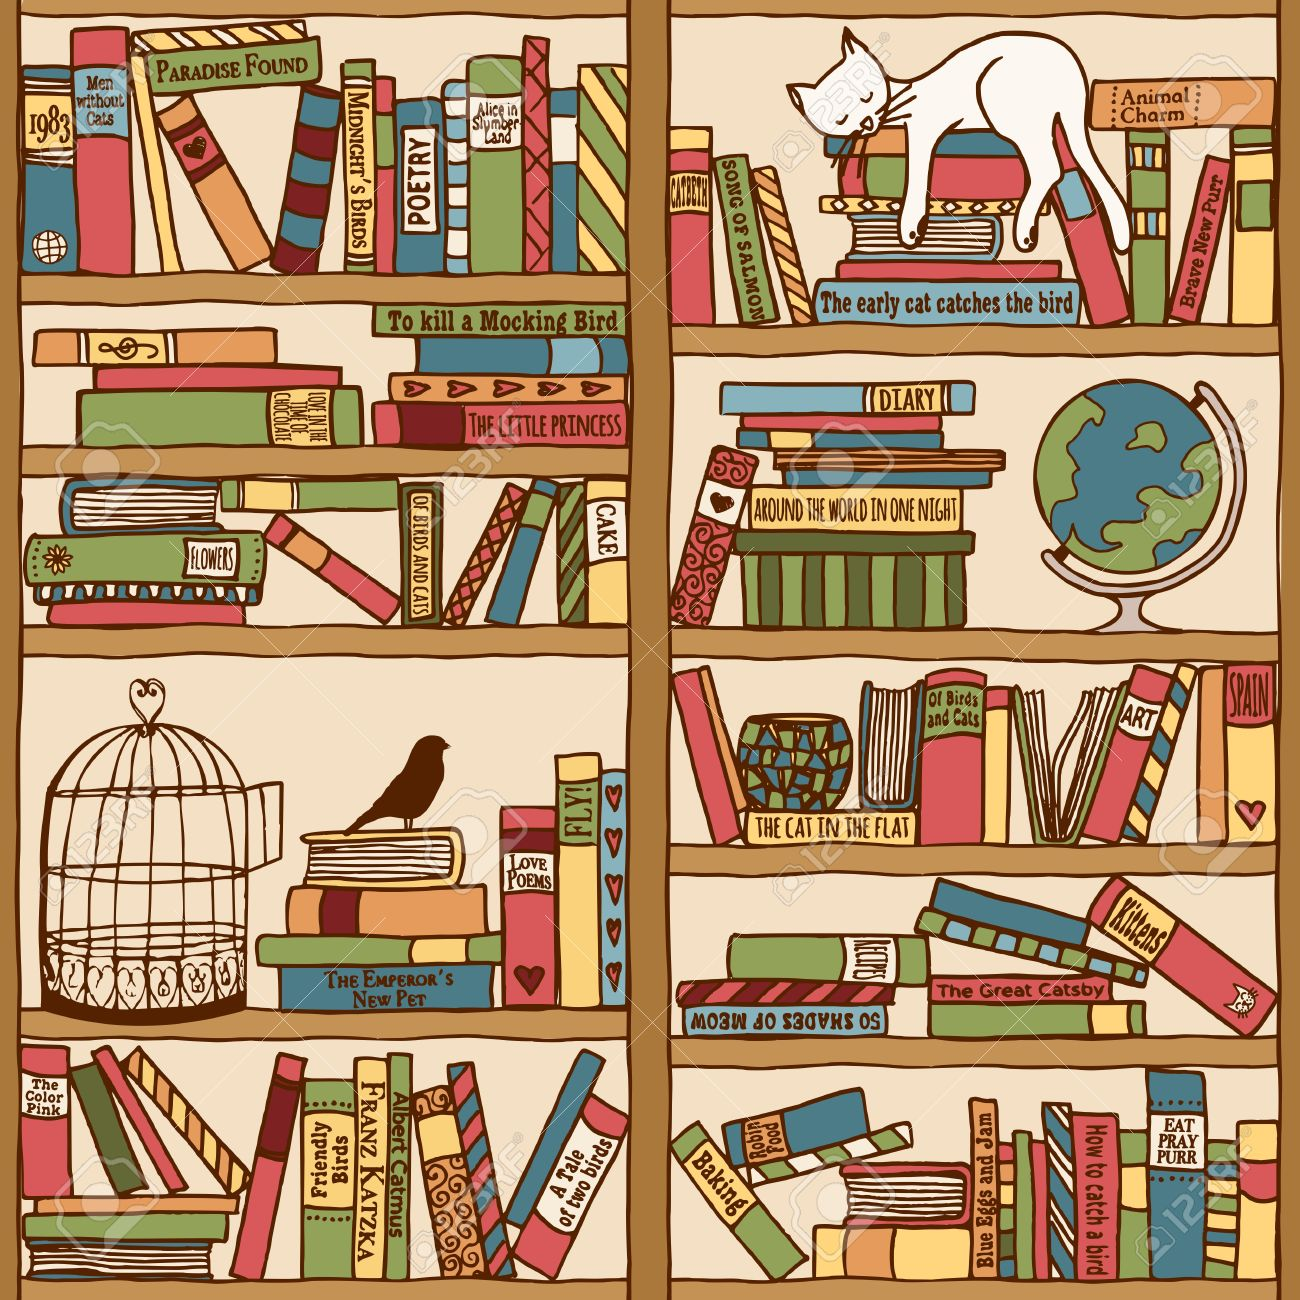 Bücherregal gezeichnet  Bücherregal Gezeichnet   ambiznes.com